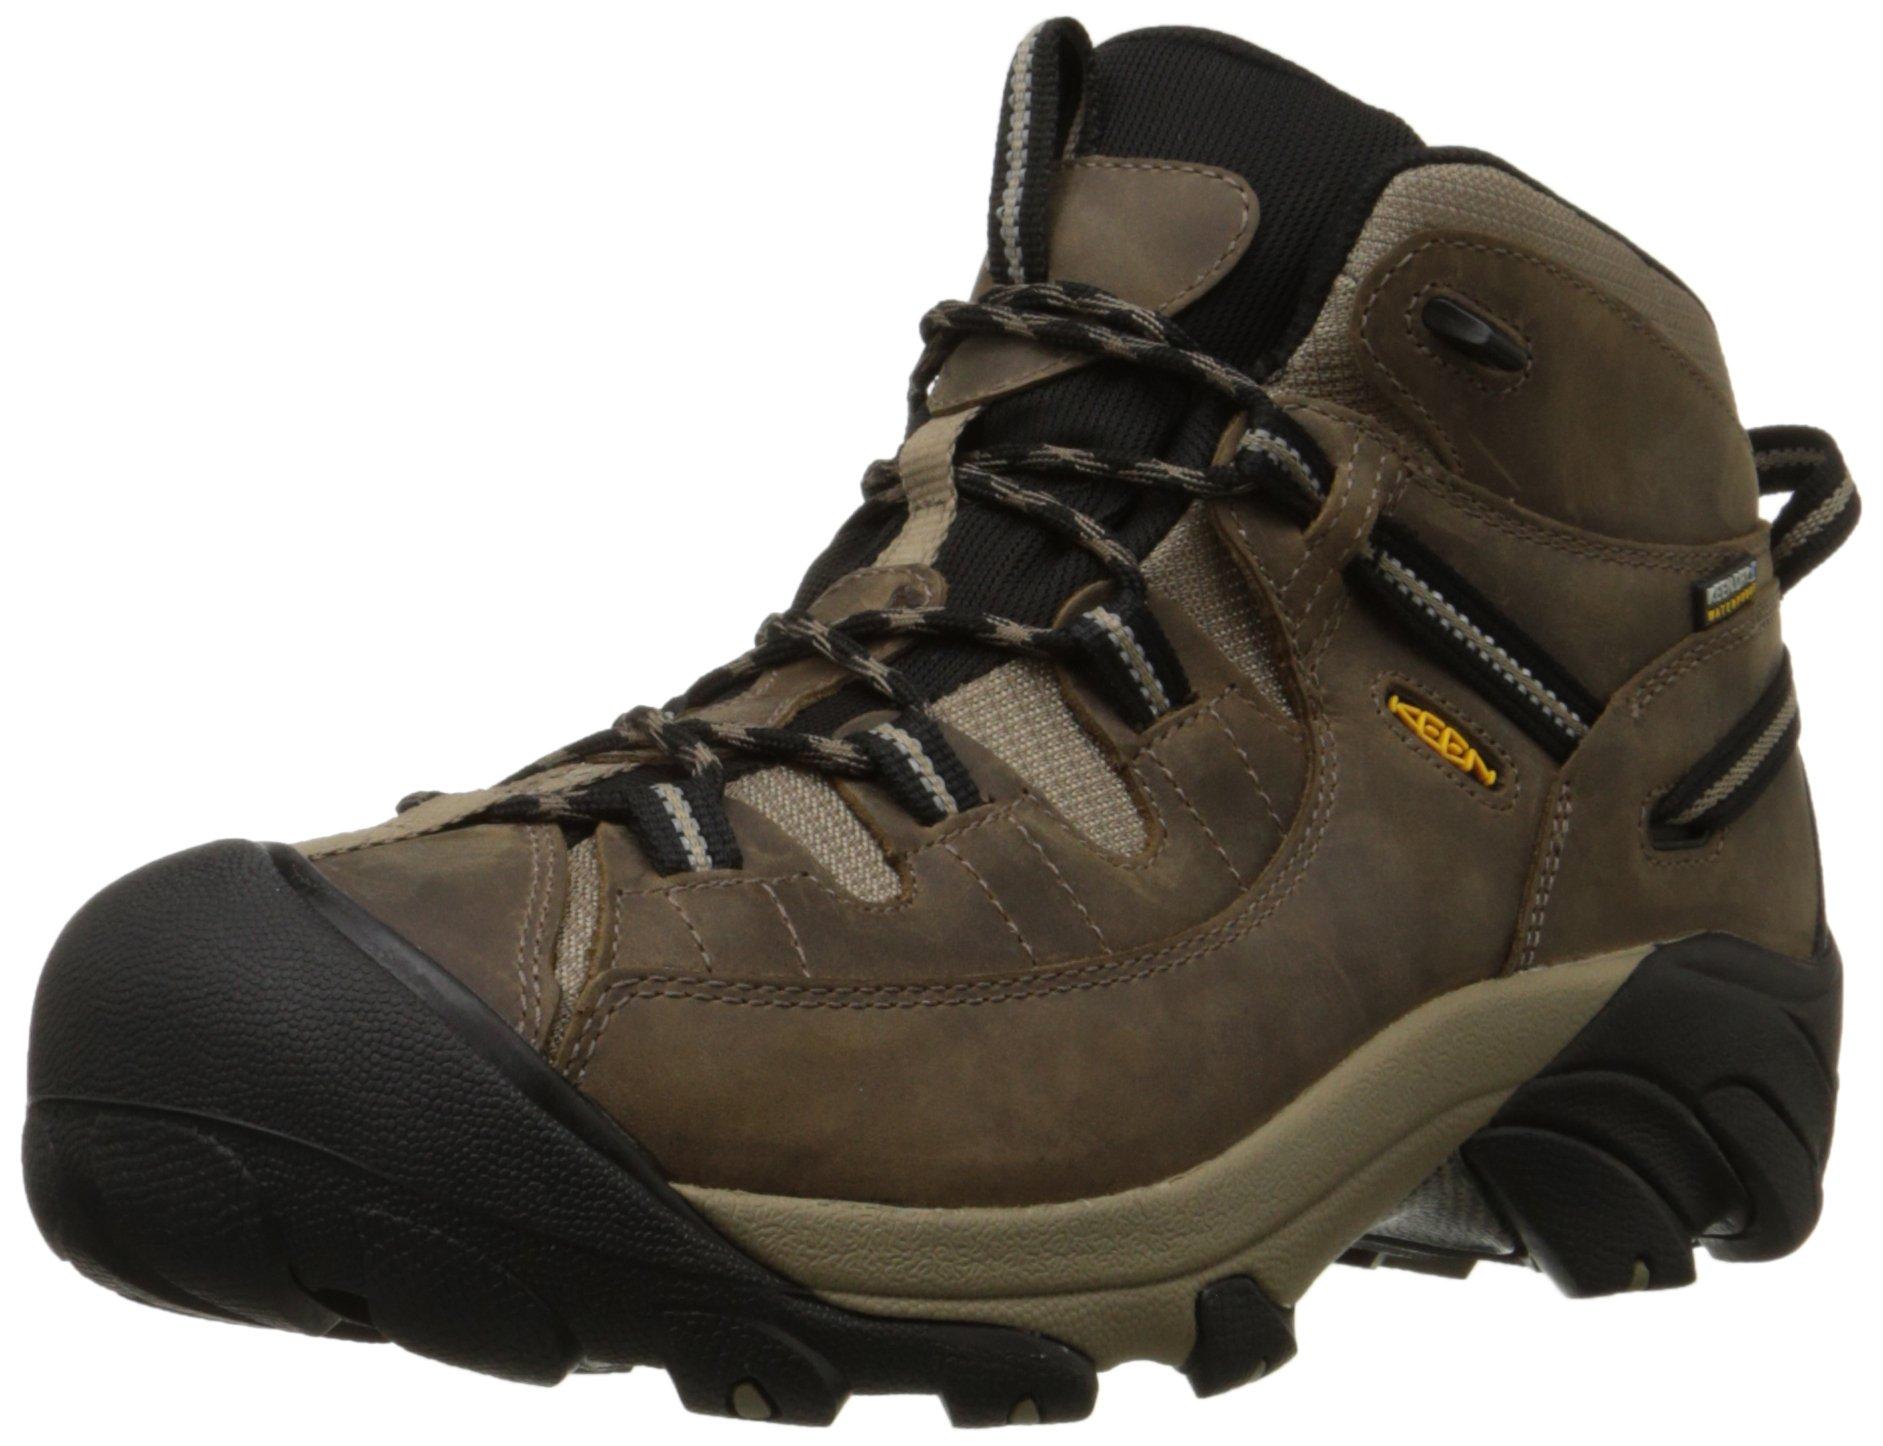 6c64db4d8dd4 Best Rated in Men s Trekking   Hiking Boots   Helpful Customer ...